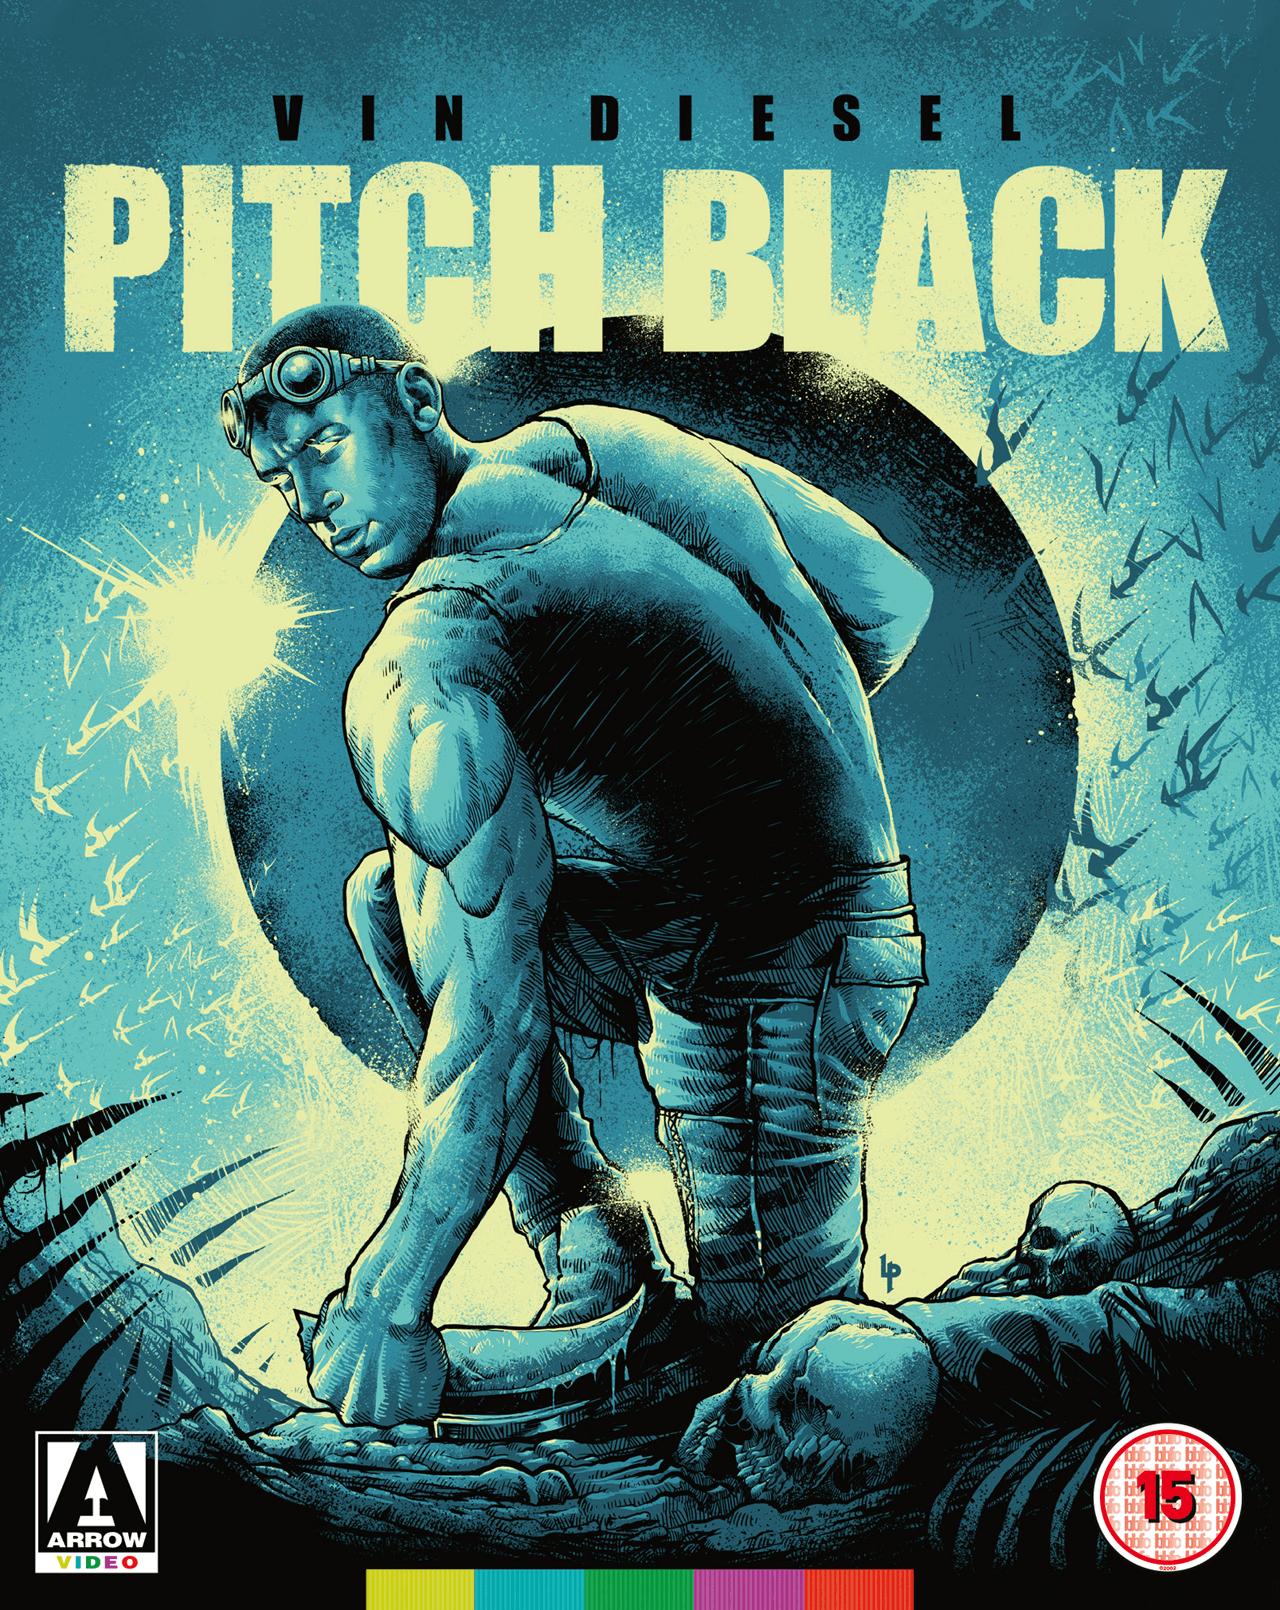 Pitch Black - 1